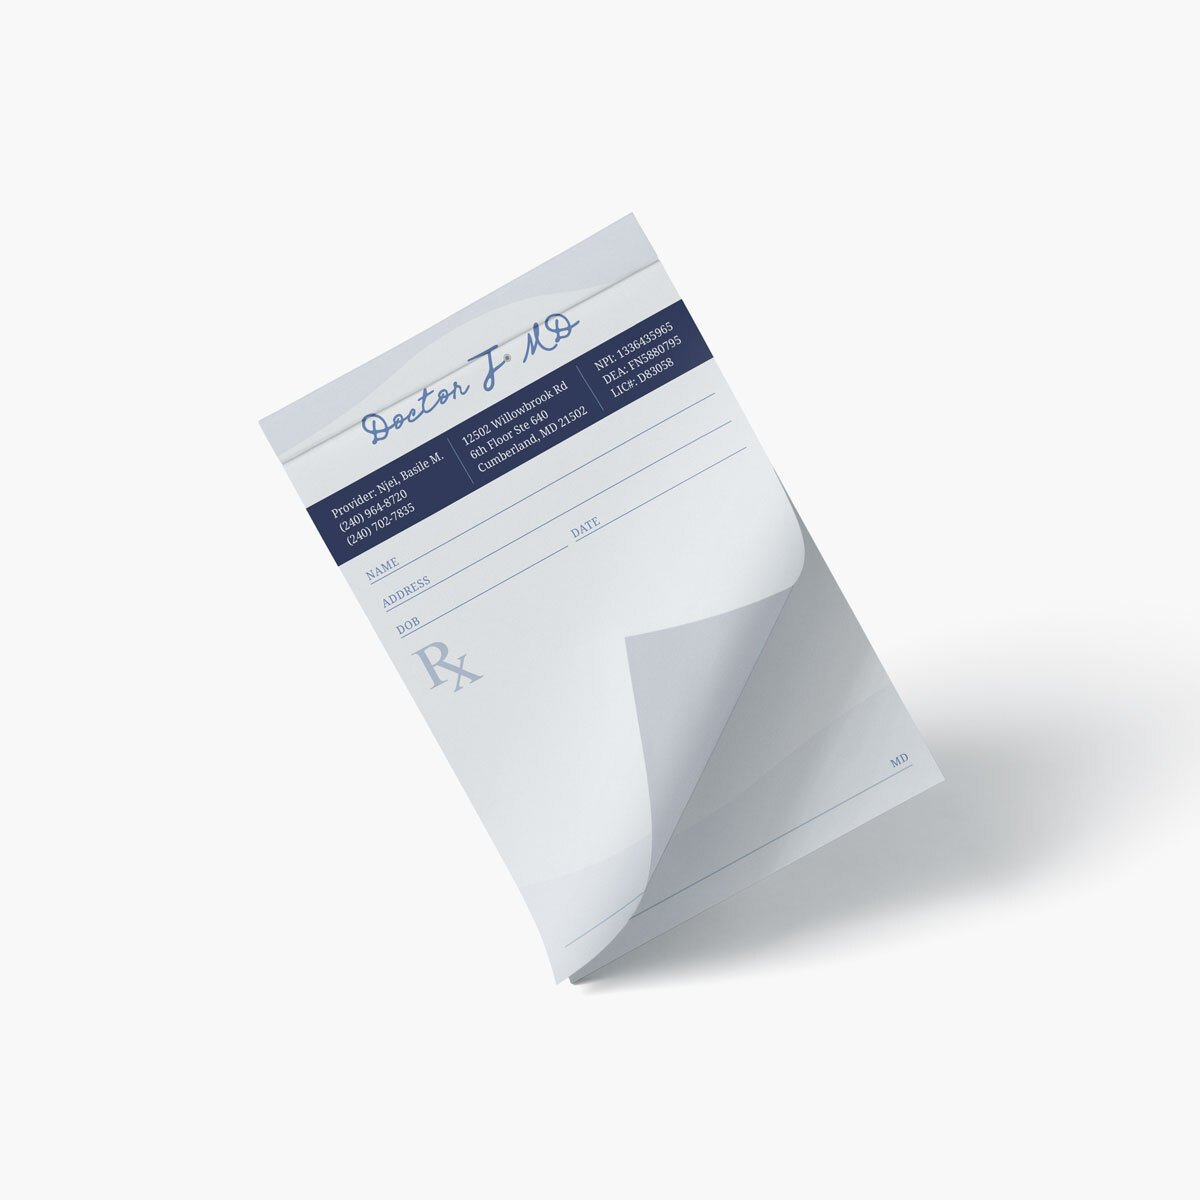 Doctor J MD Prescription Pad Design by BrandSwan, a graphic design company